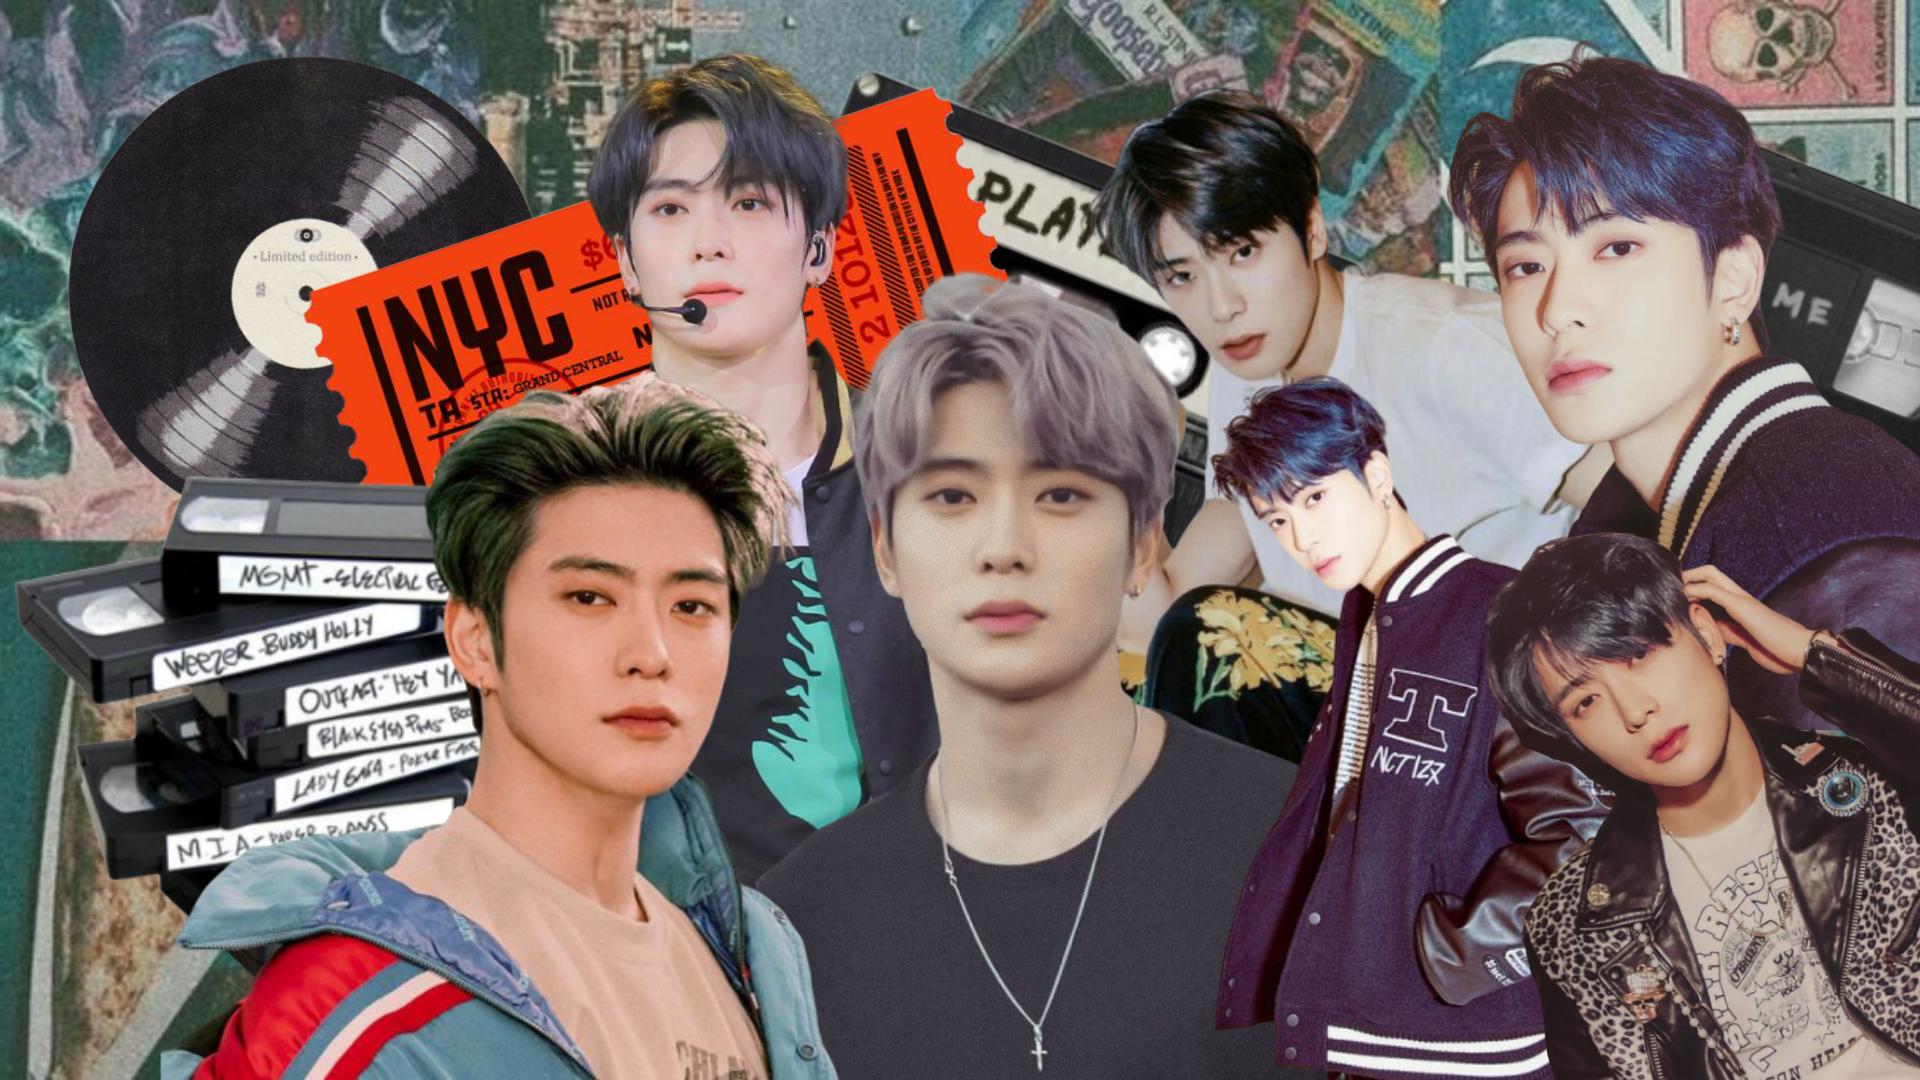 Jung Jaehyun Desktop Wallpaper Di 2020 Gambar Seni Seni Inspirasi